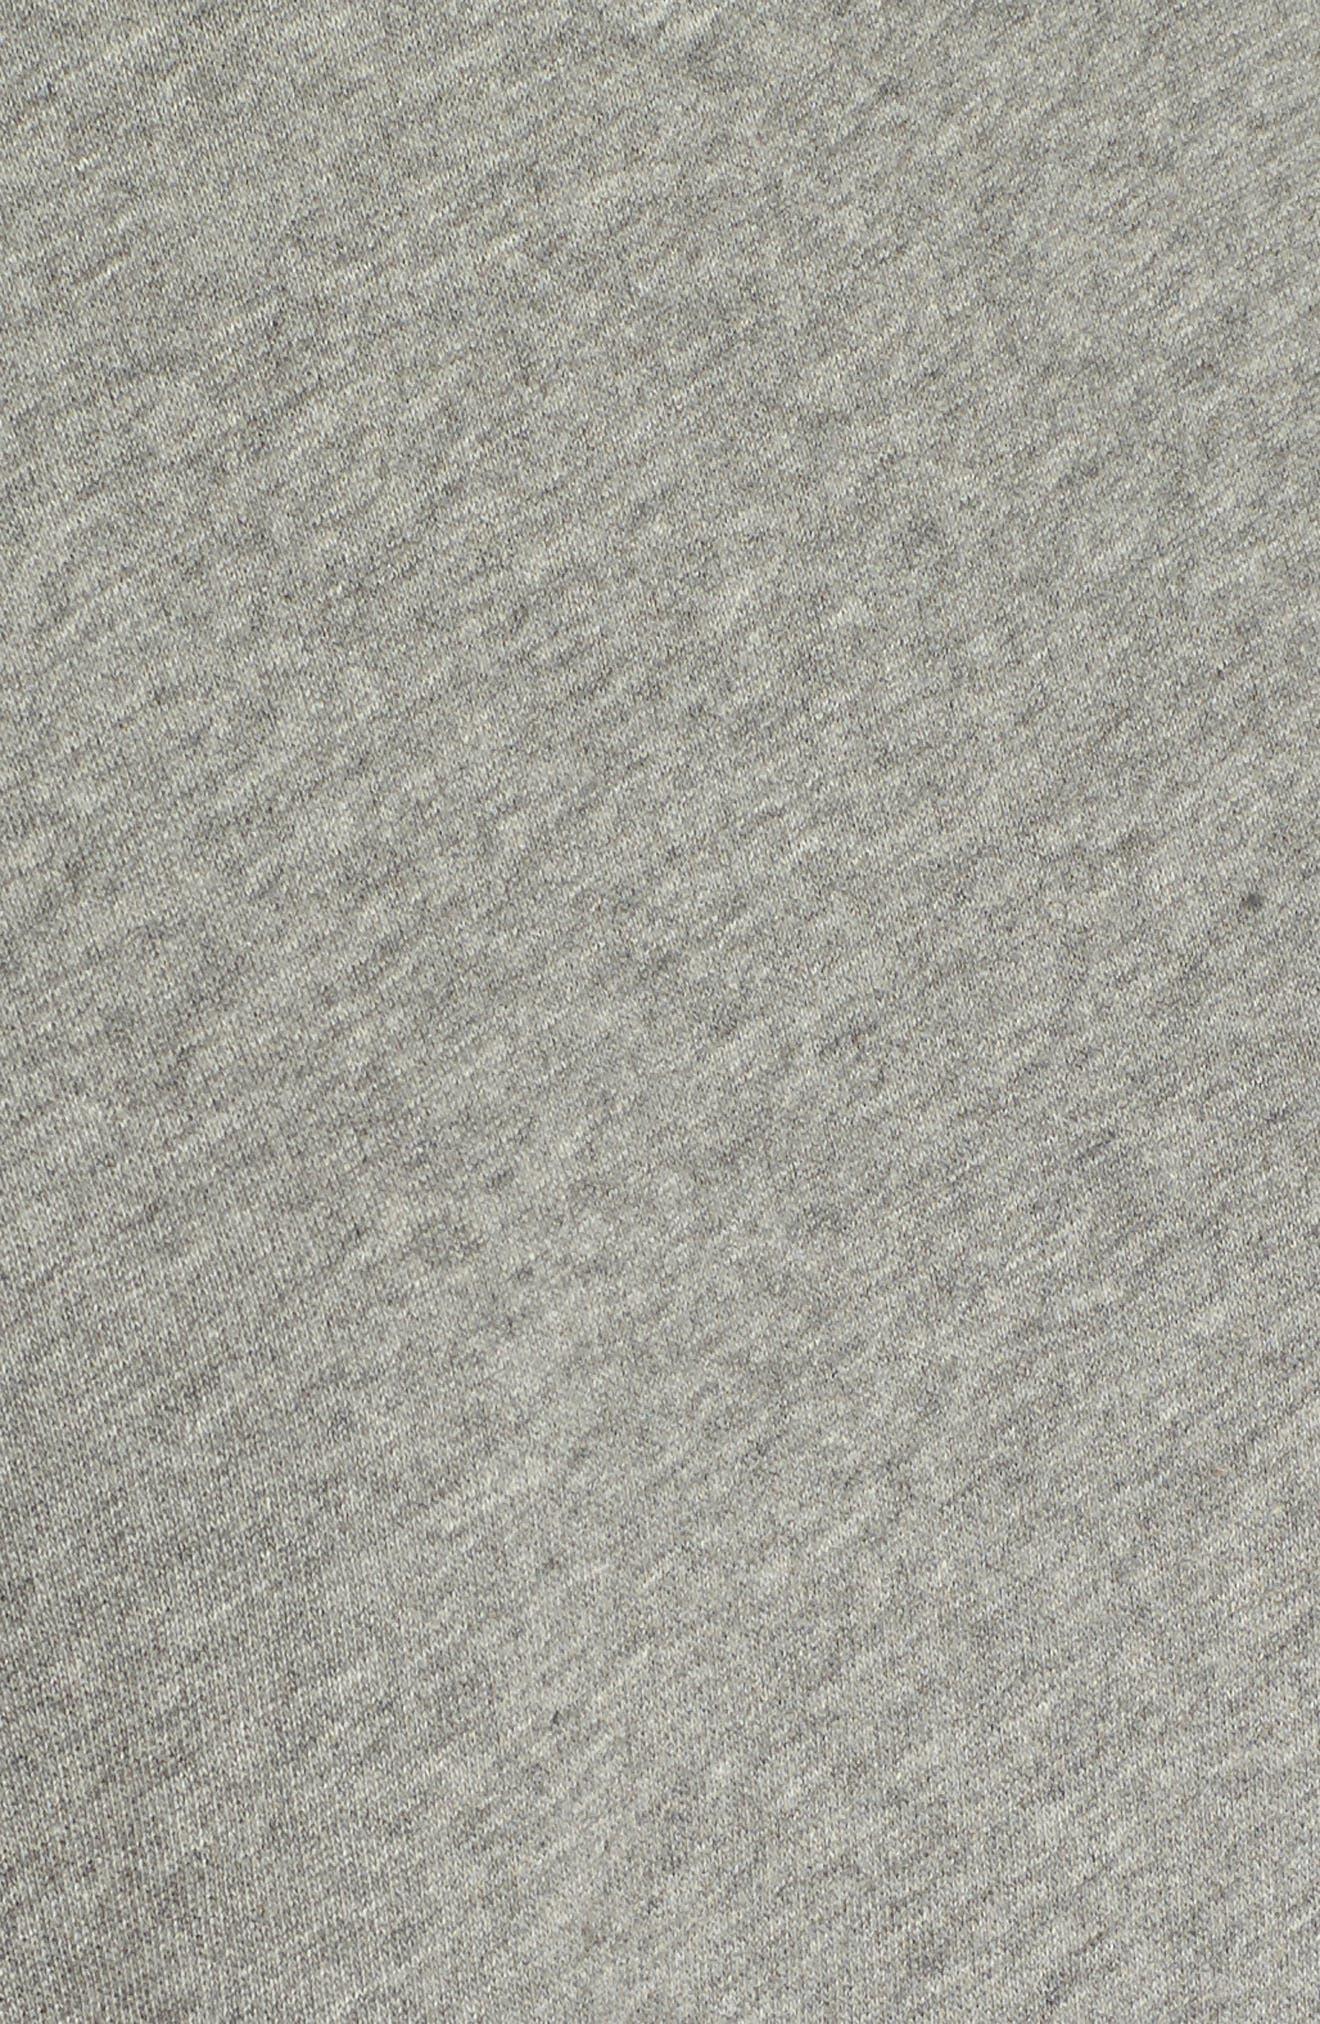 Ruched Sleeve Sweatshirt,                             Alternate thumbnail 5, color,                             030